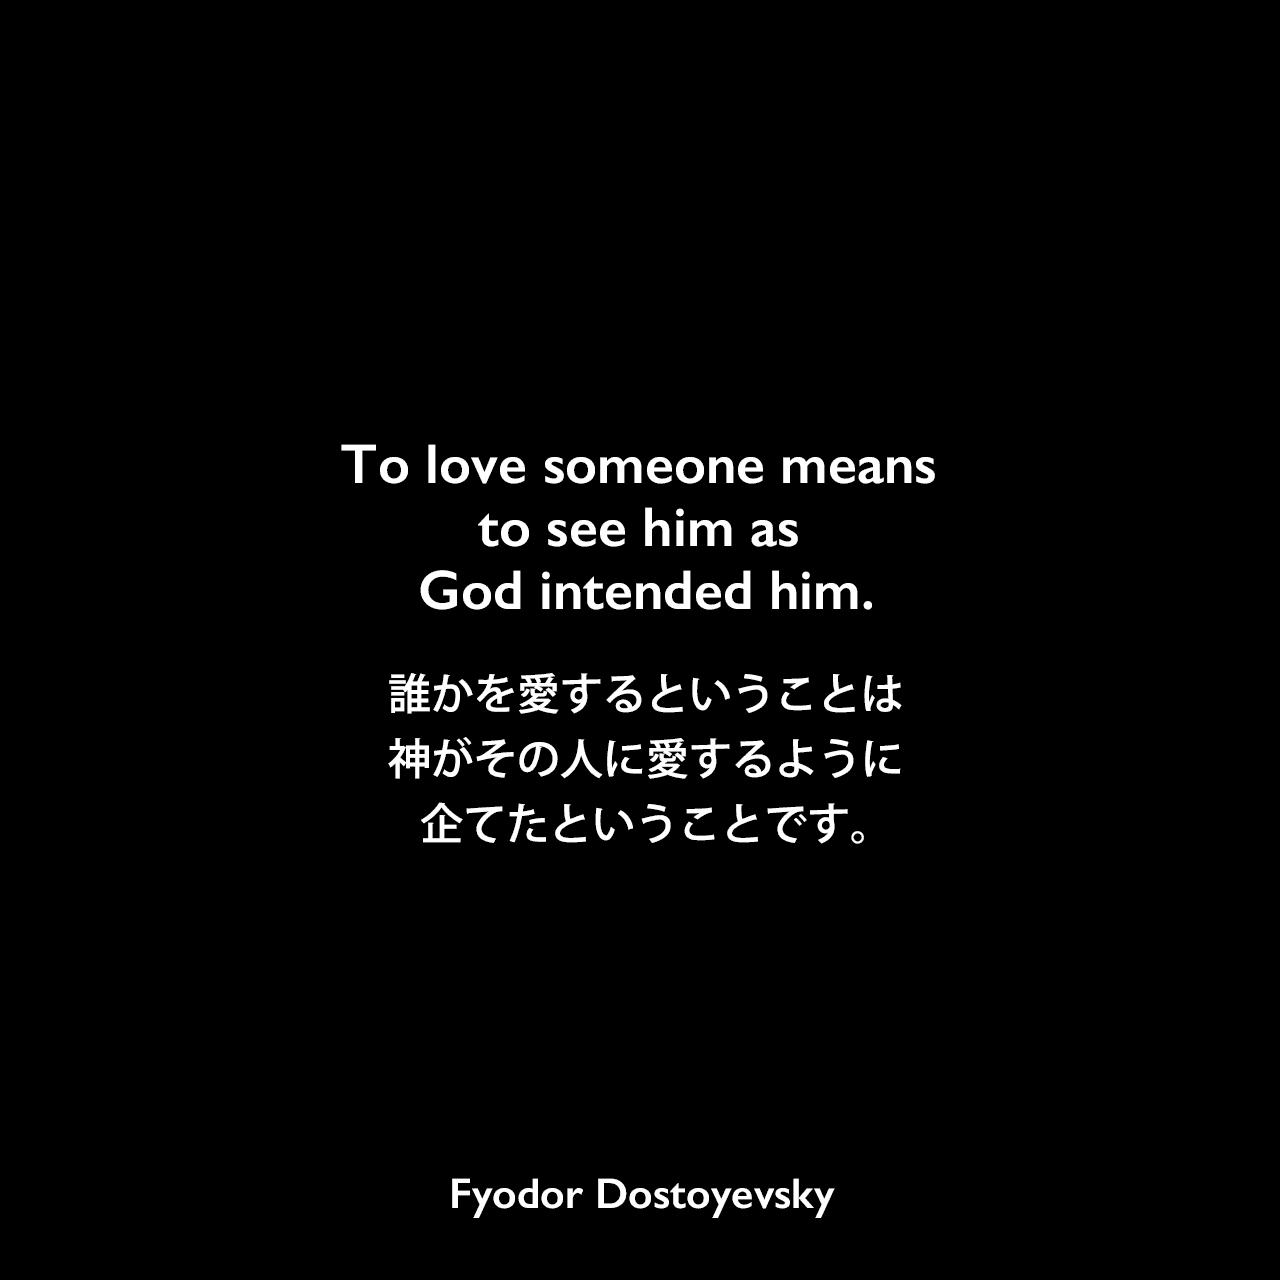 To love someone means to see him as God intended him.誰かを愛するということは、神がその人に愛するように企てたということです。Fyodor Dostoyevsky